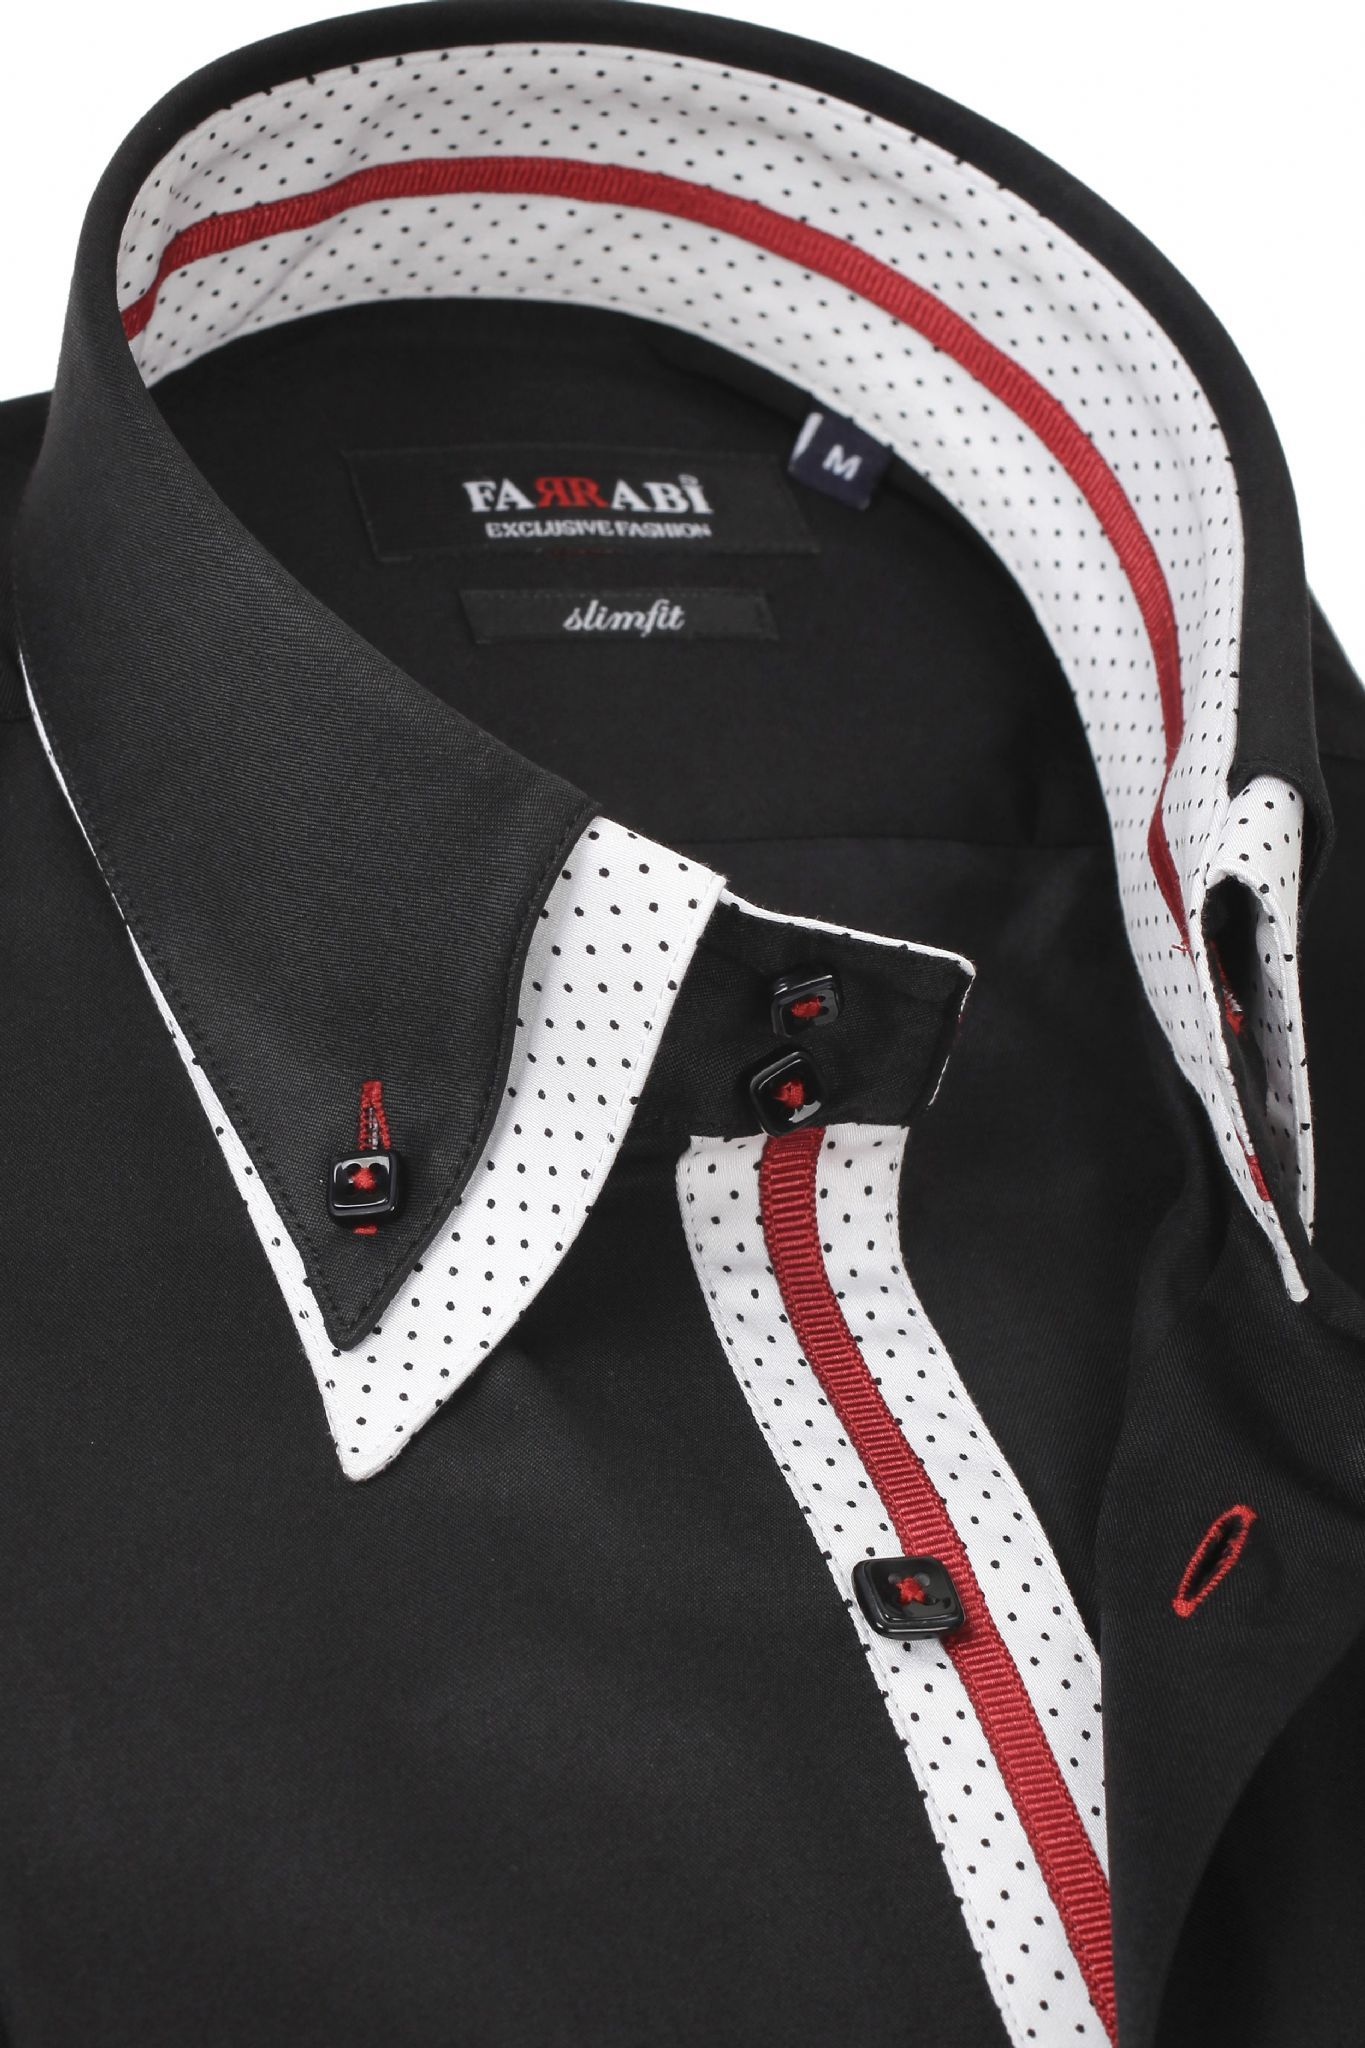 F7 black shirt farrabi slim fit exclusive luxury